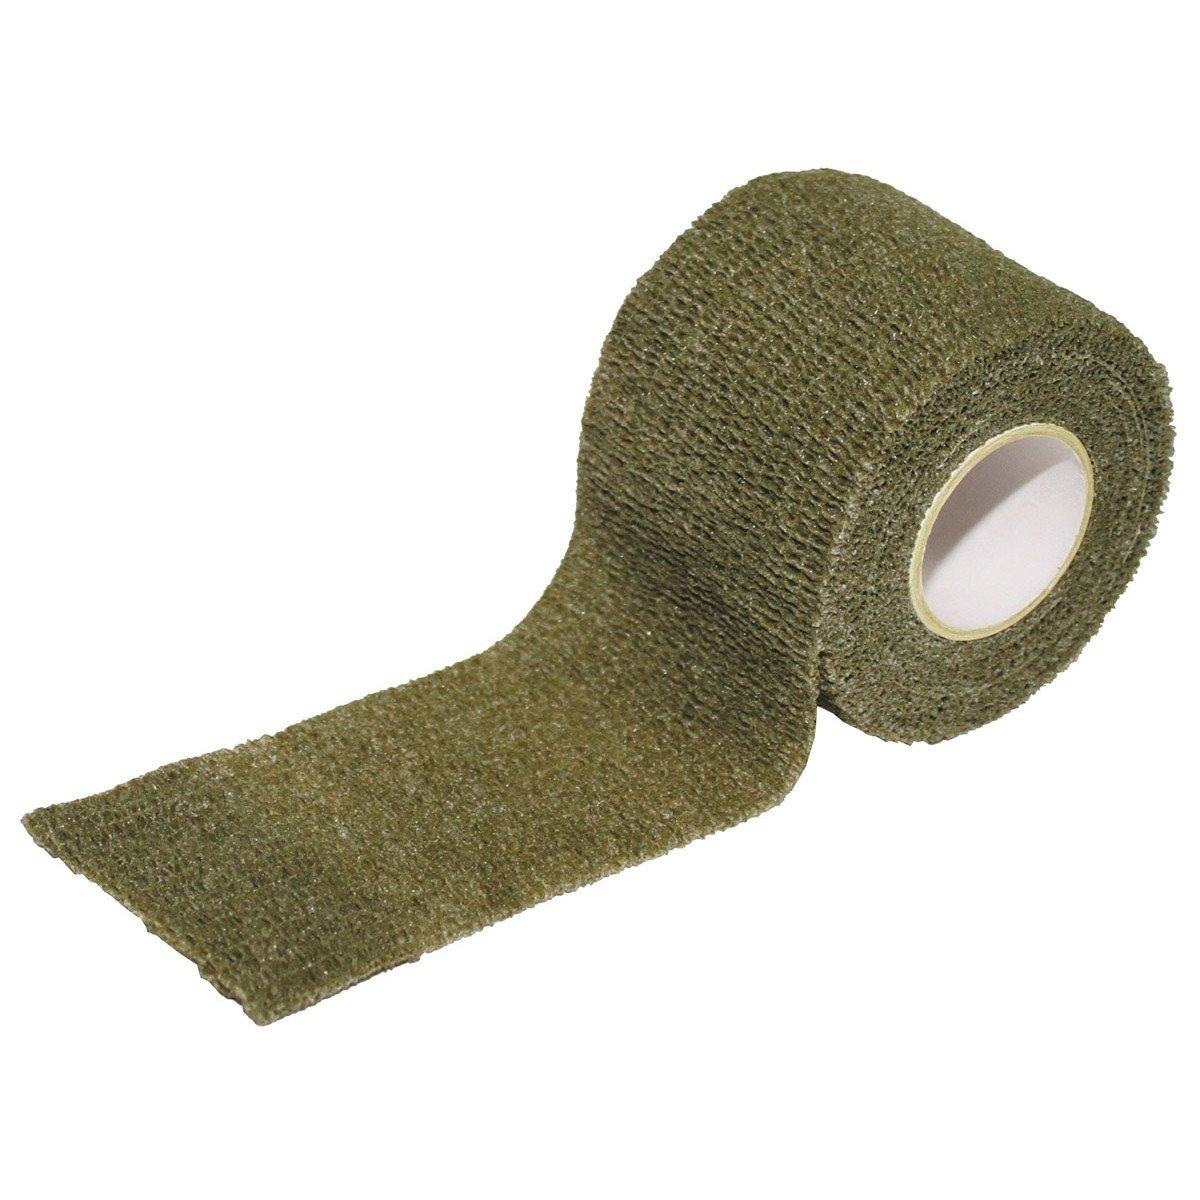 Camo tape, self-adhesive, 5 cm x 4.5 m, OD green ...